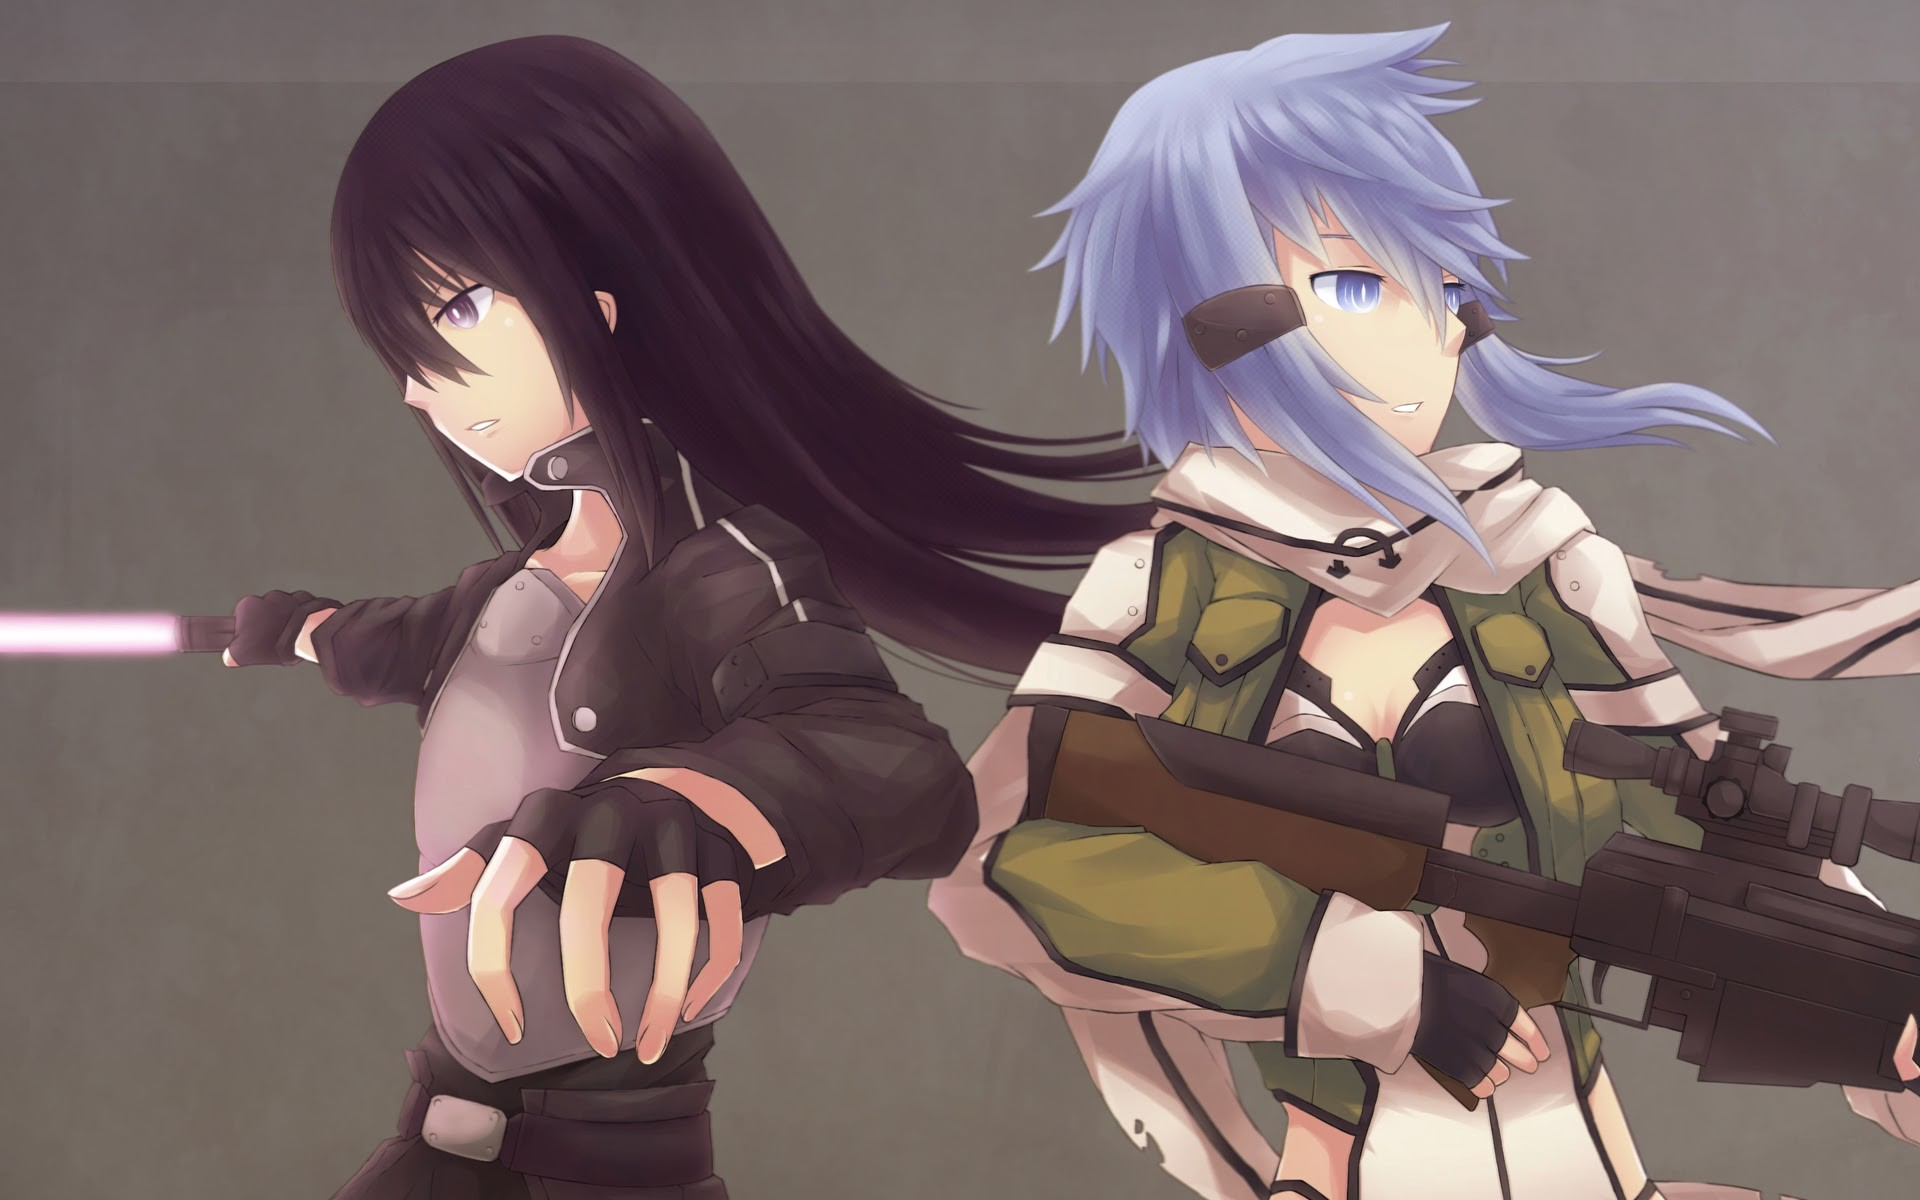 sinon kirito sword art online 2 gun gale online anime 2014 hd wallpaper